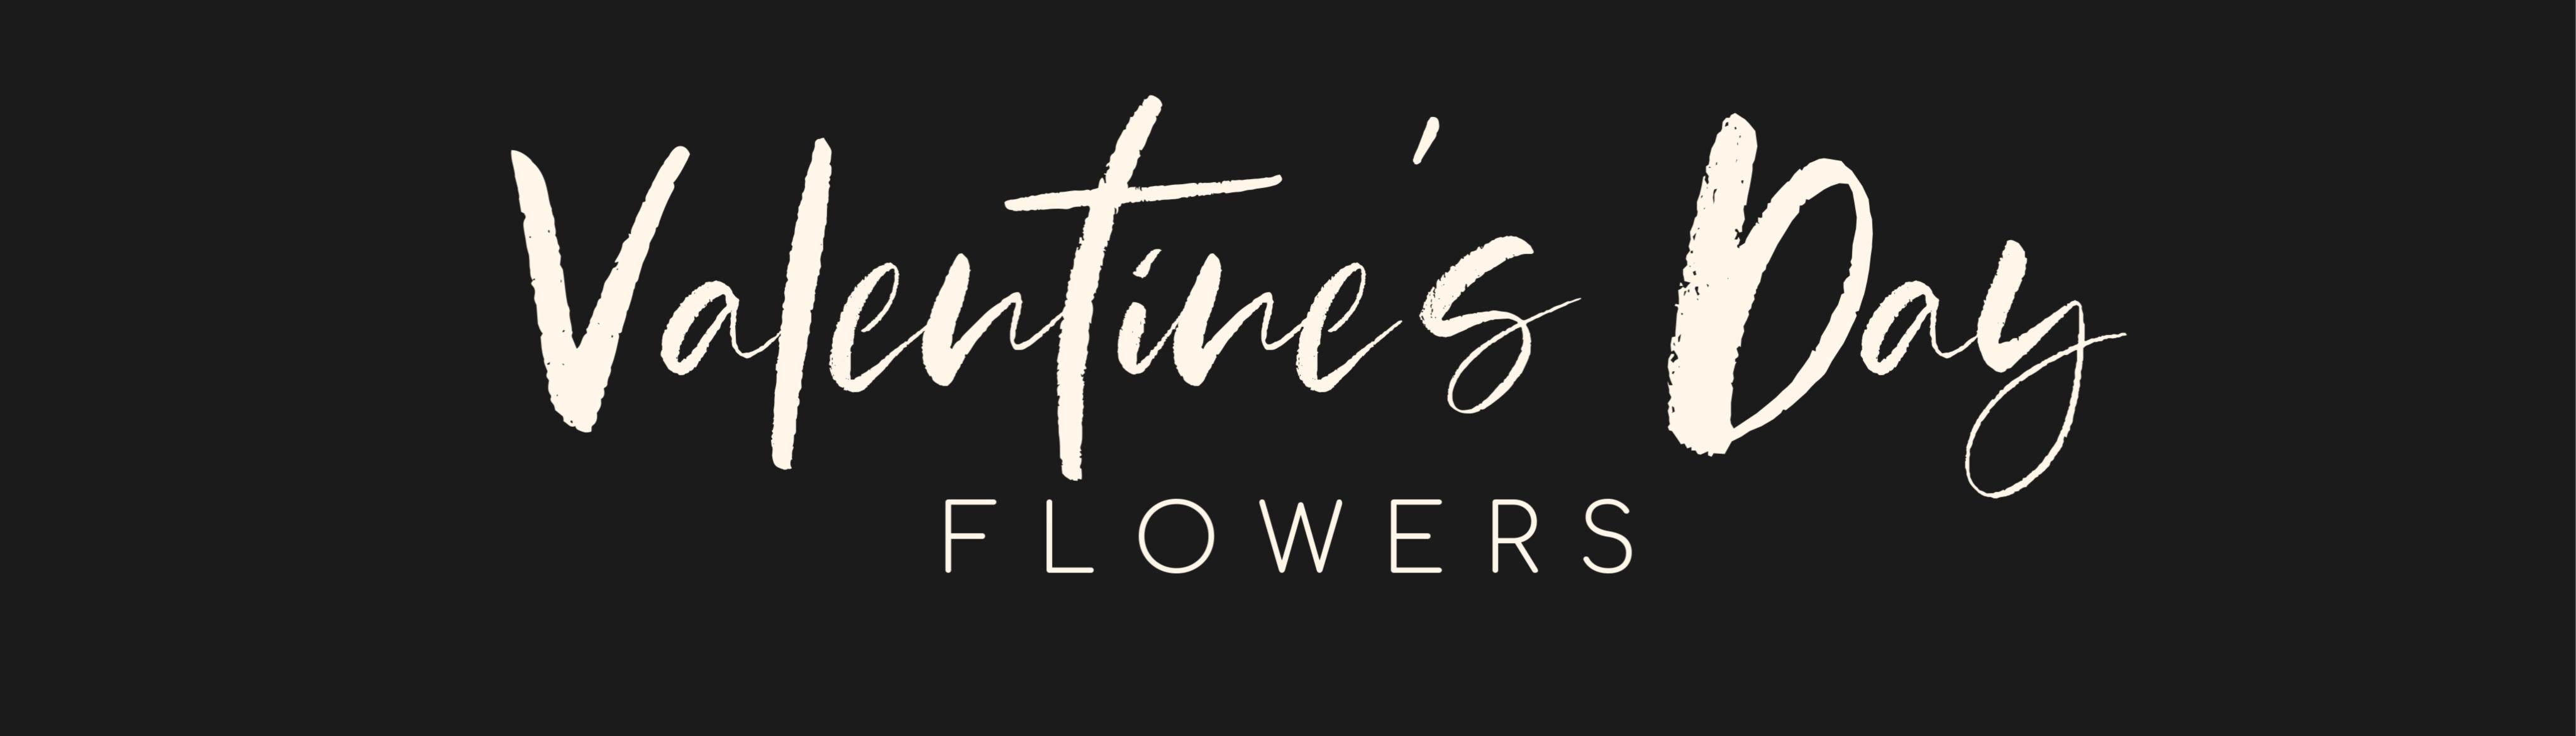 valentines-flowers.jpg